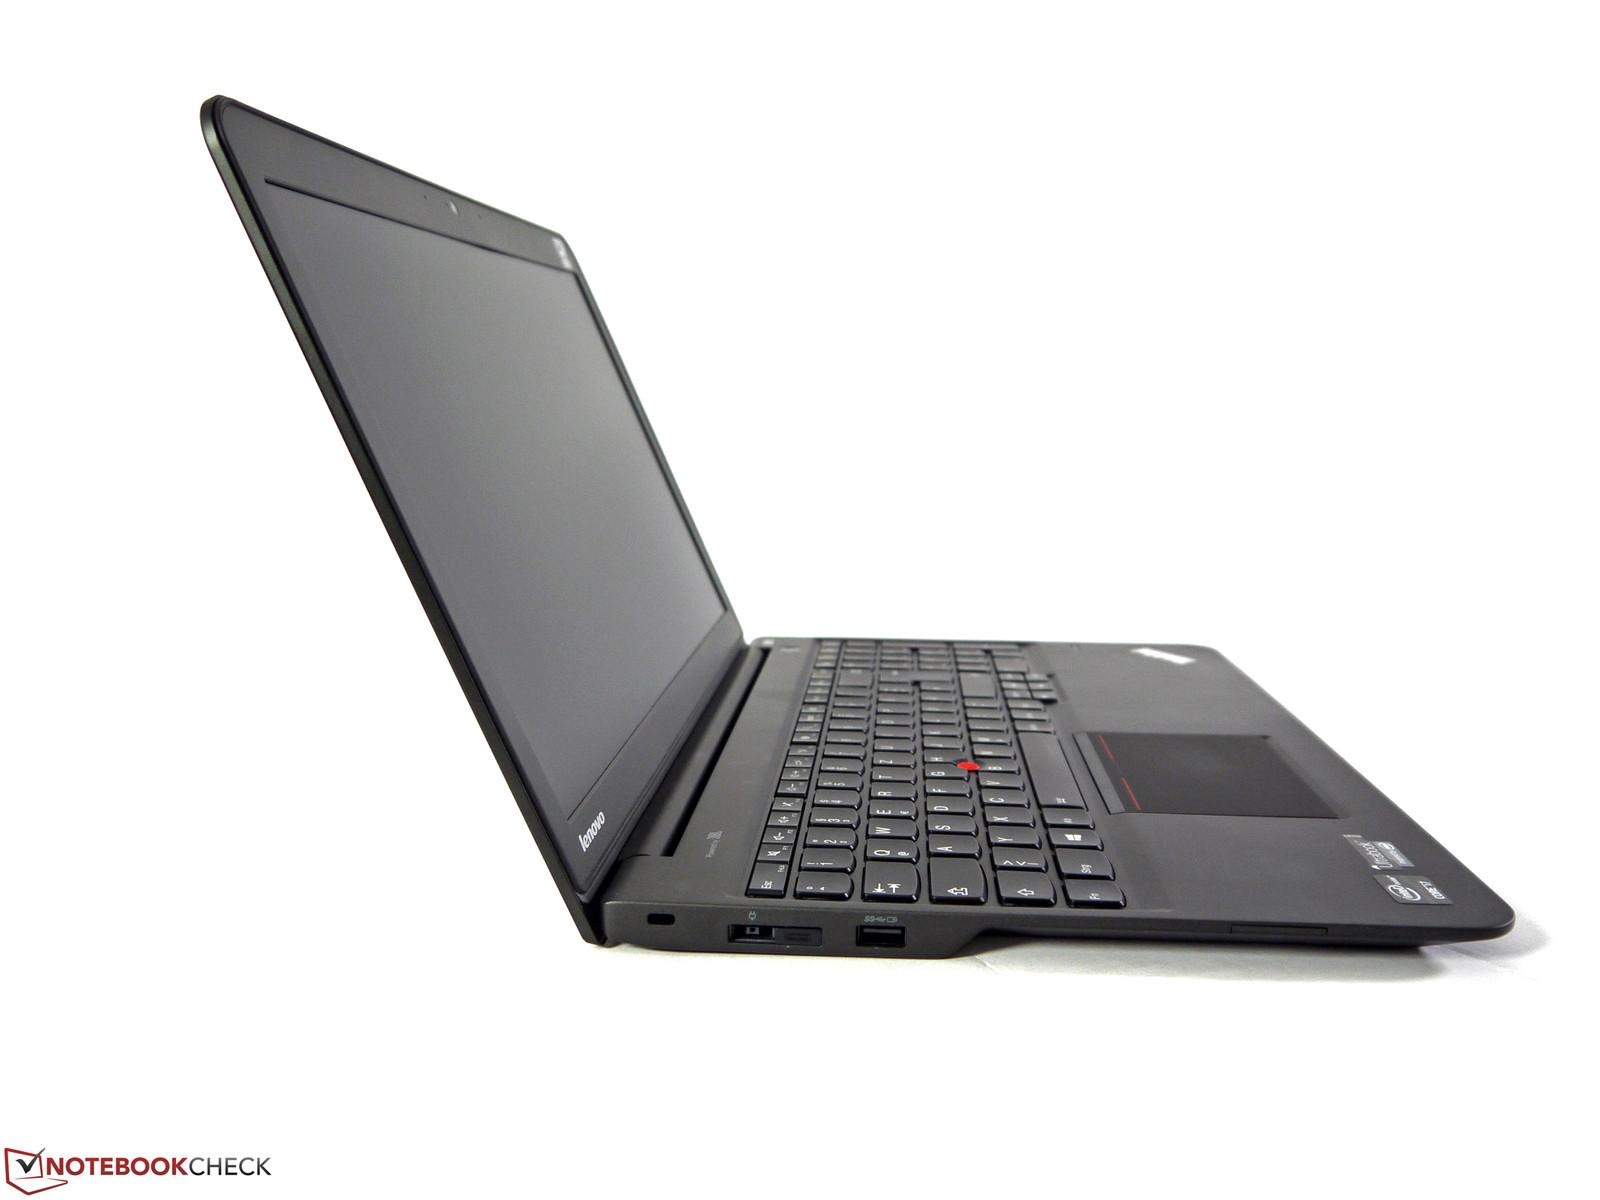 Driver UPDATE: Lenovo ThinkPad S531 Power Management